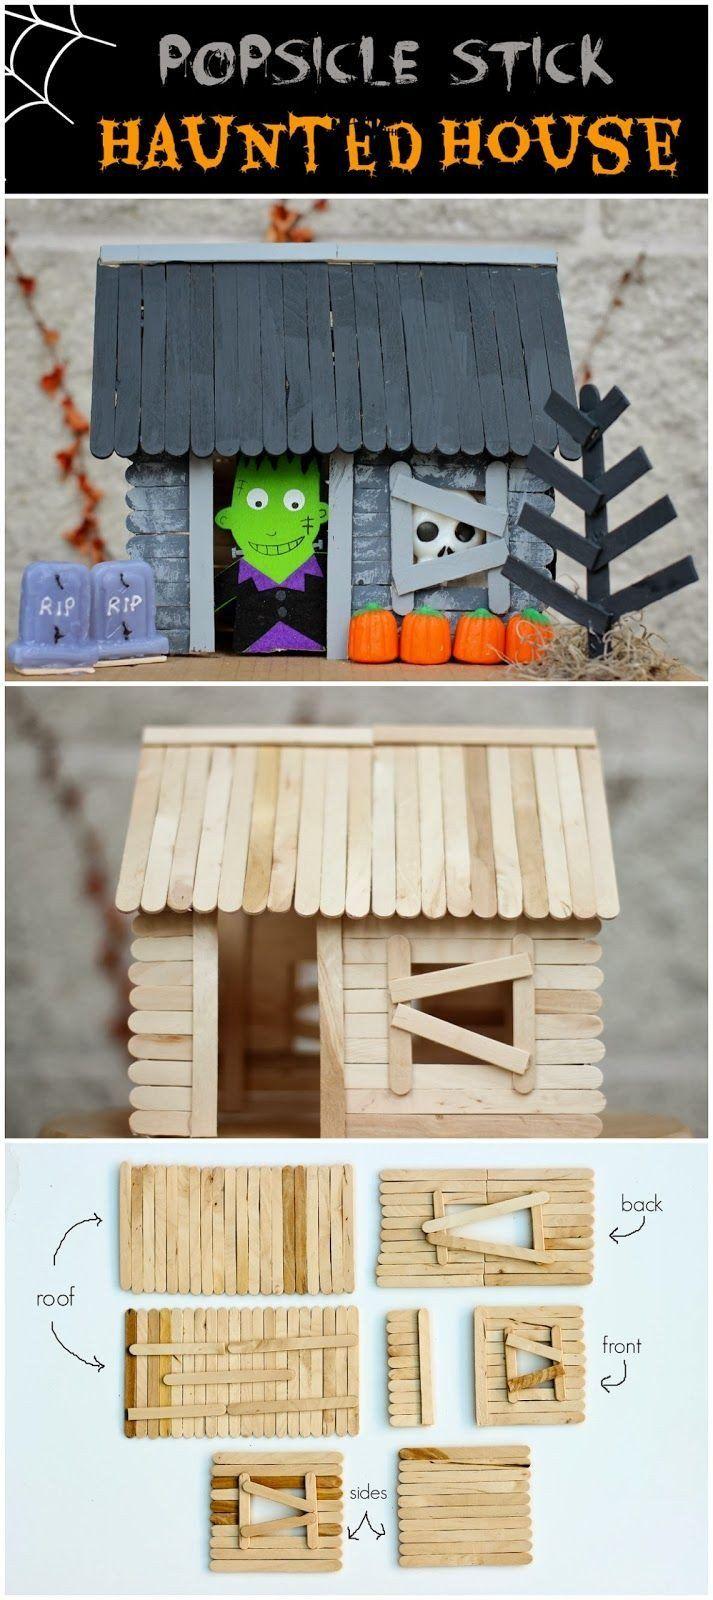 19+ Diy halloween crafts 2020 information